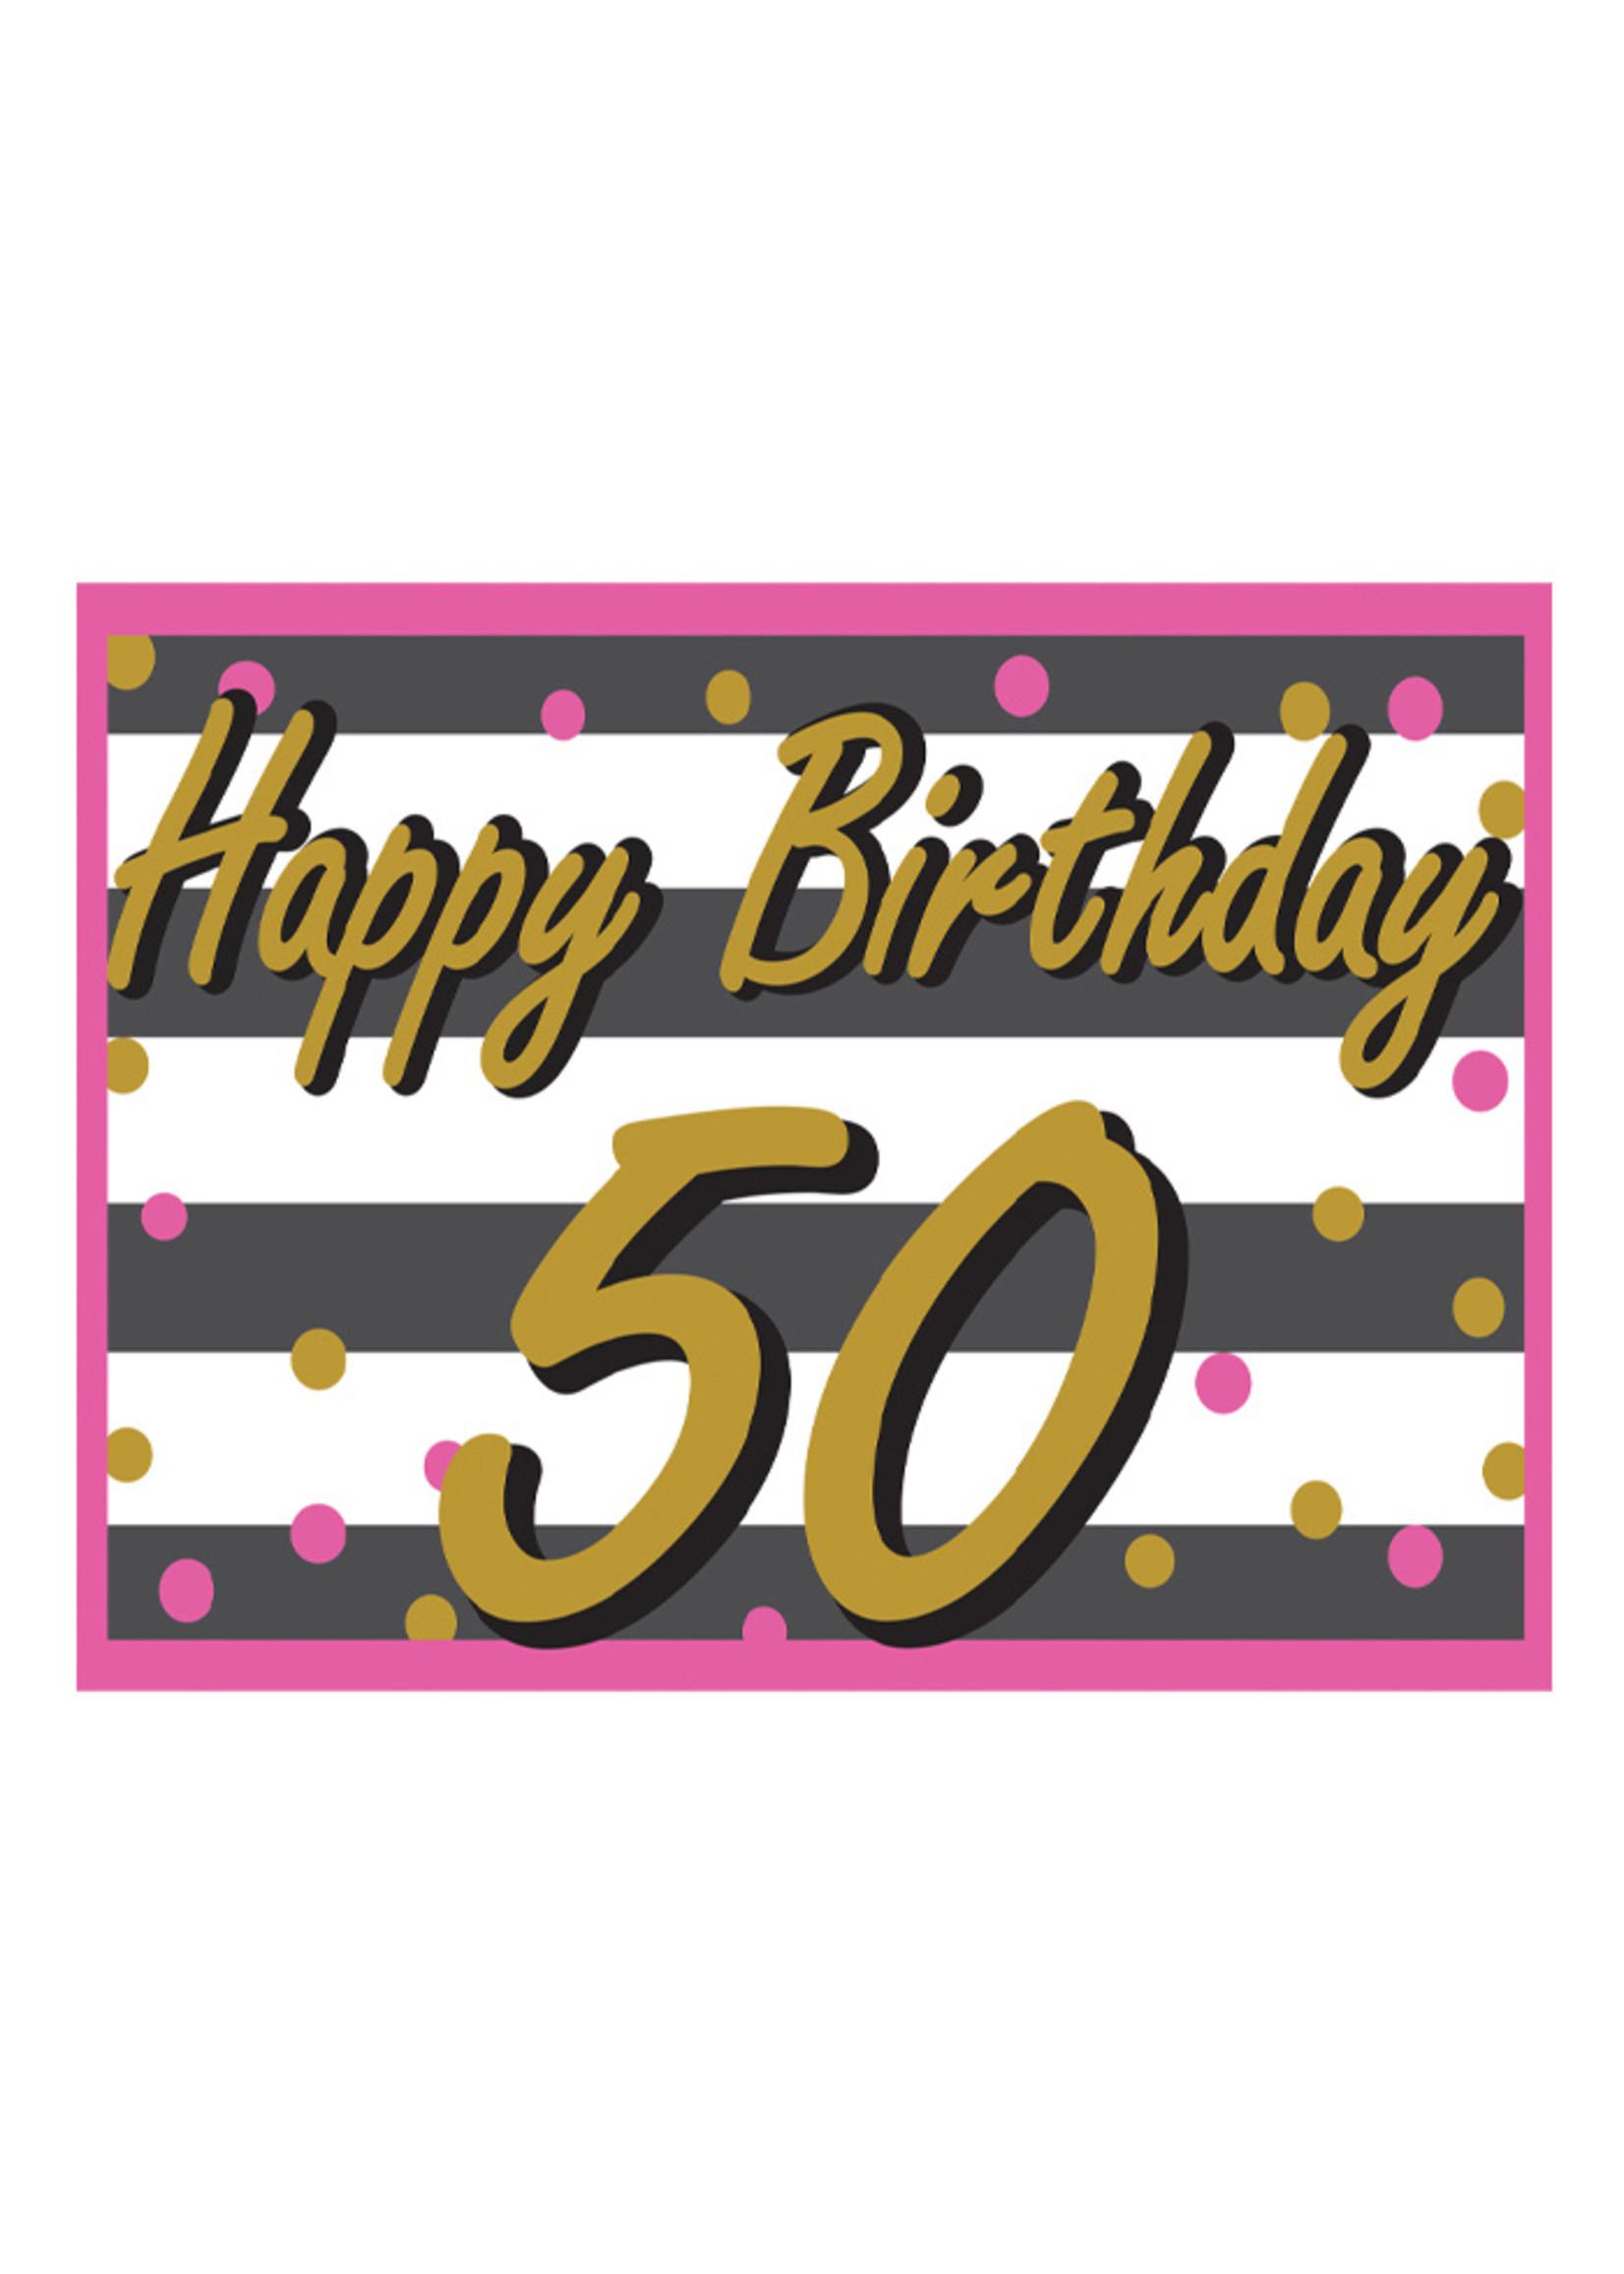 Happy Birthday 50th Pink & Gold Yard Sign